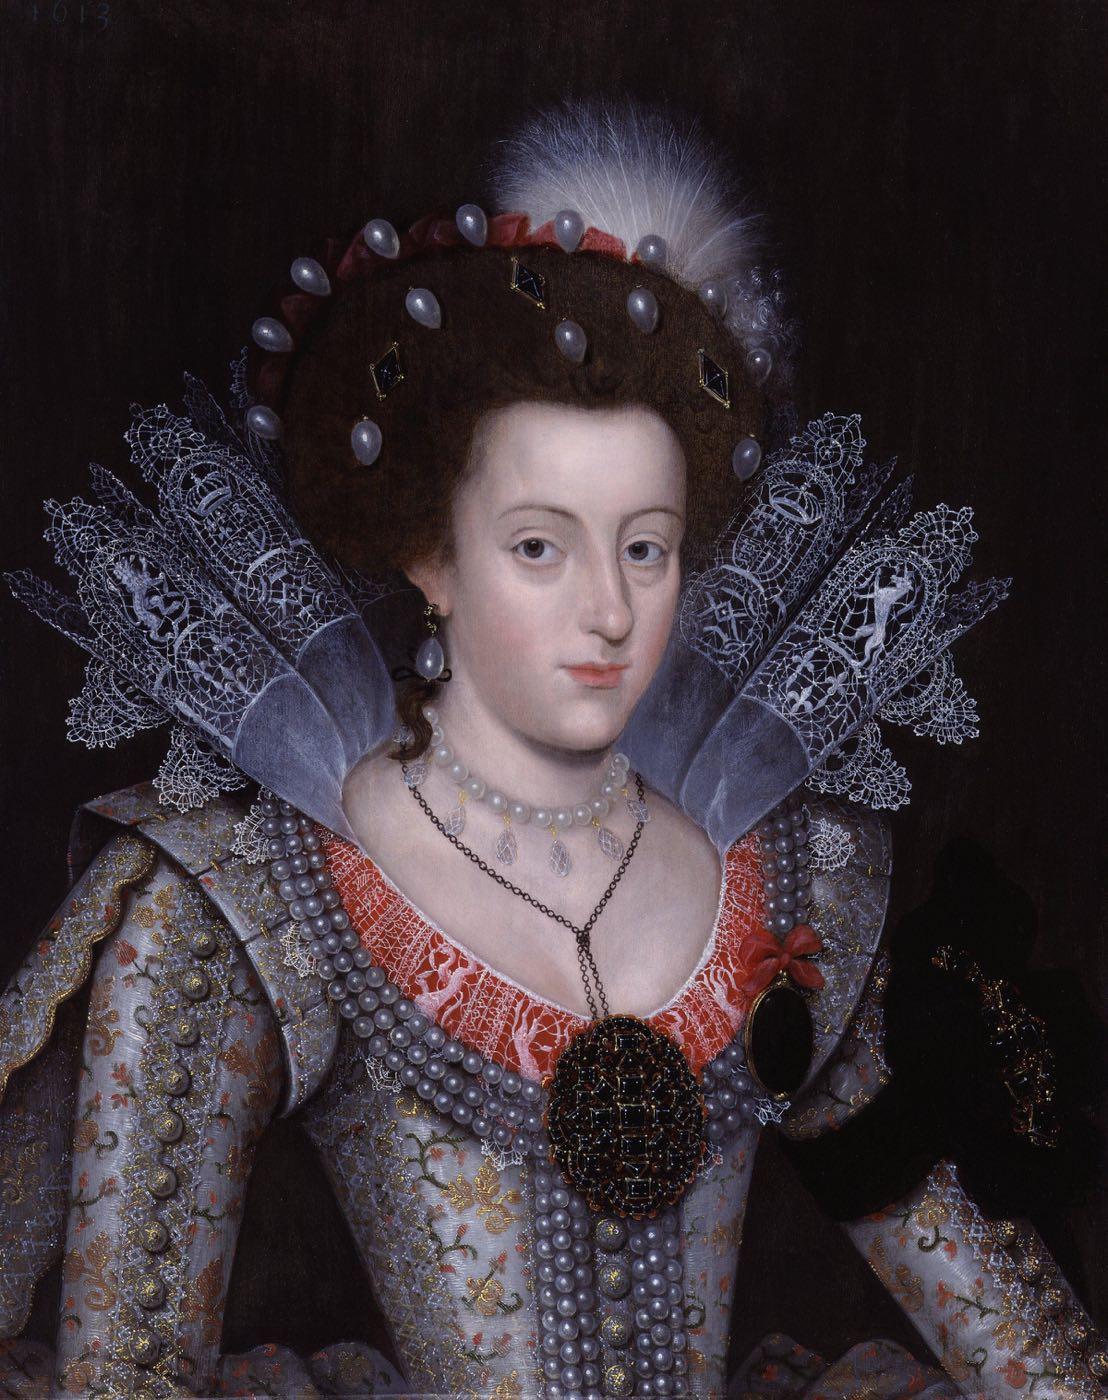 Prinzessin Elisabeth, Stuart, Königin, Böhmen, Winterkönigin, Barock, Kostüm,